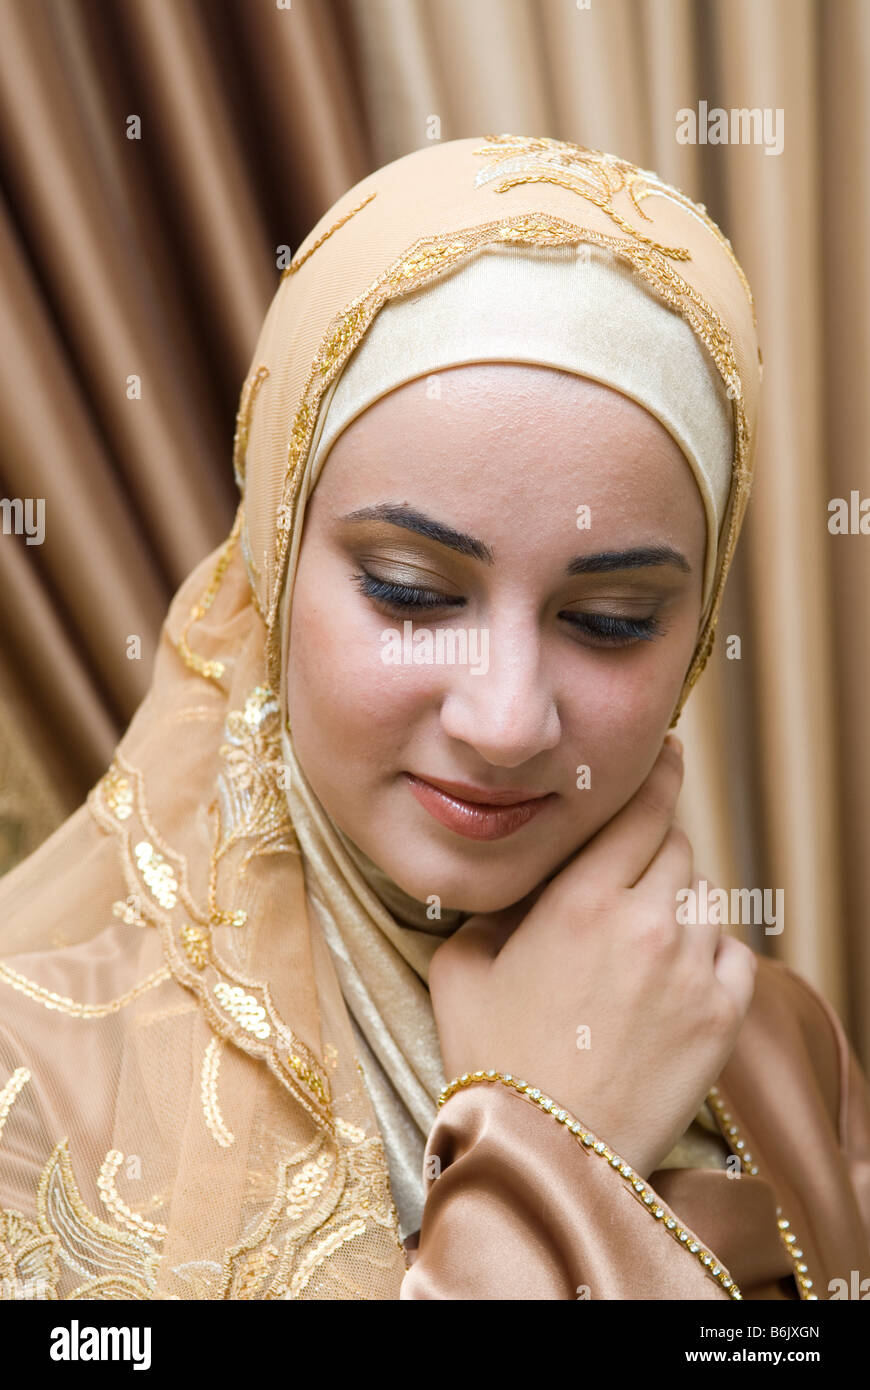 Somali hijab muslim teen girl in australia - 1 part 2